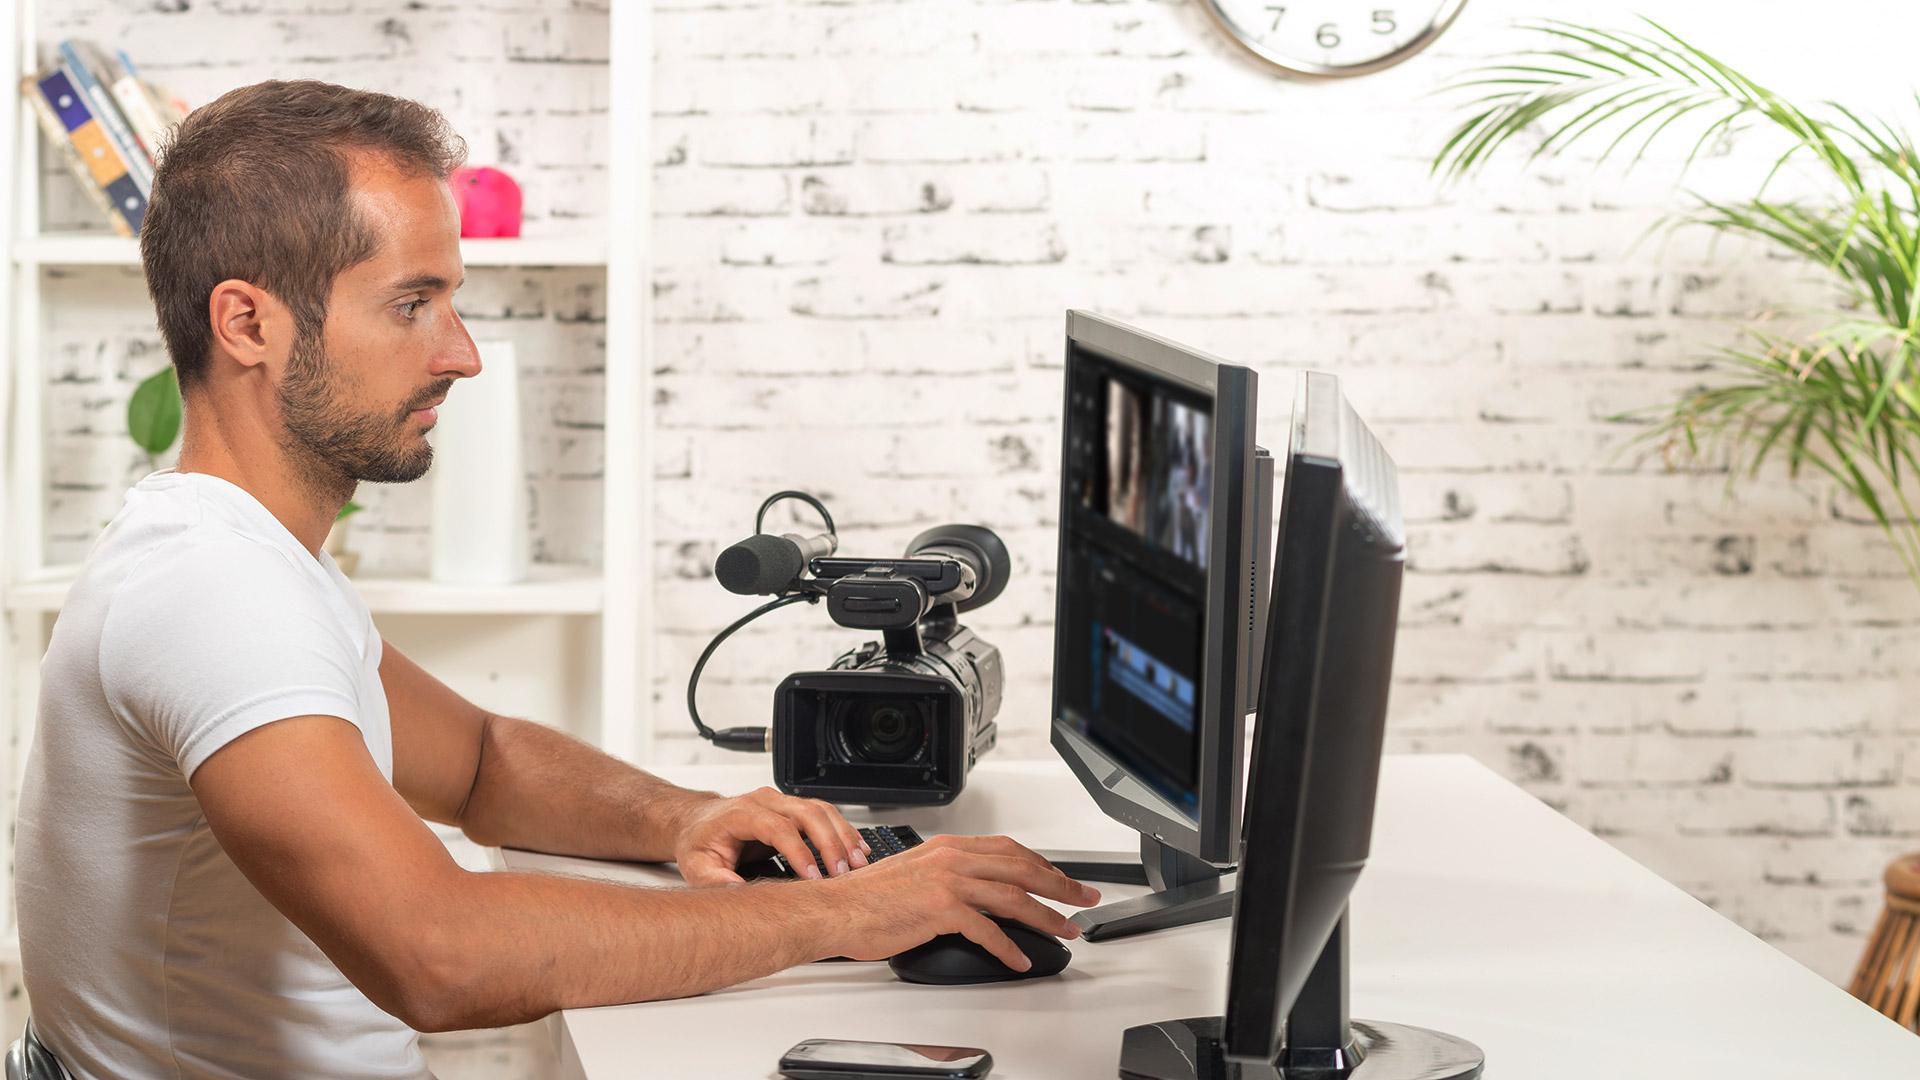 video-production-camera-desktop-computer-ss-1920